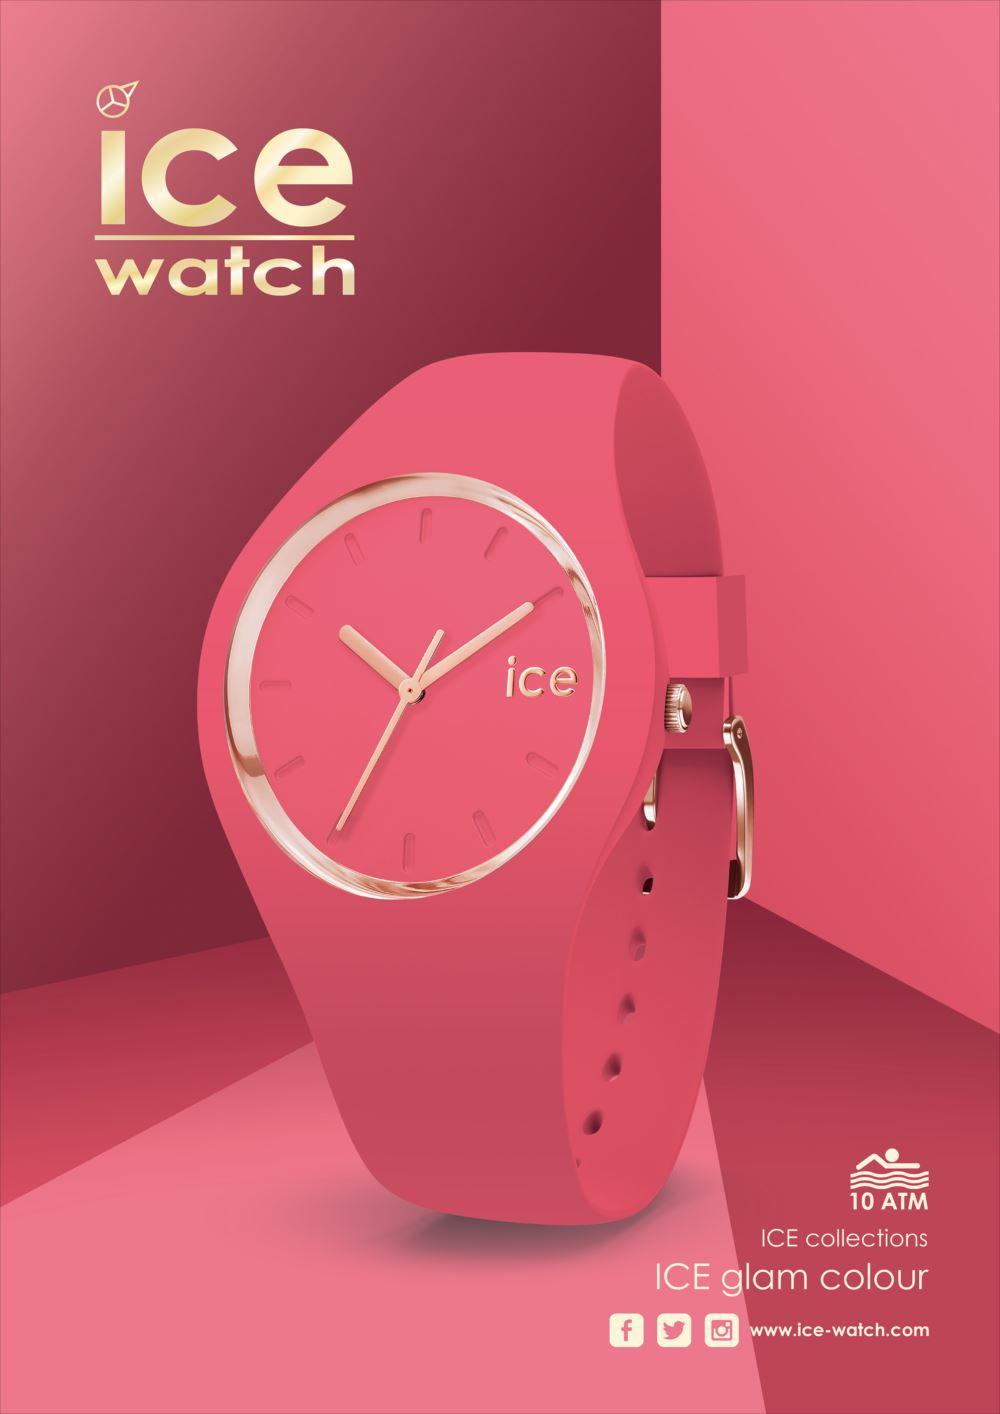 ICE glam colour